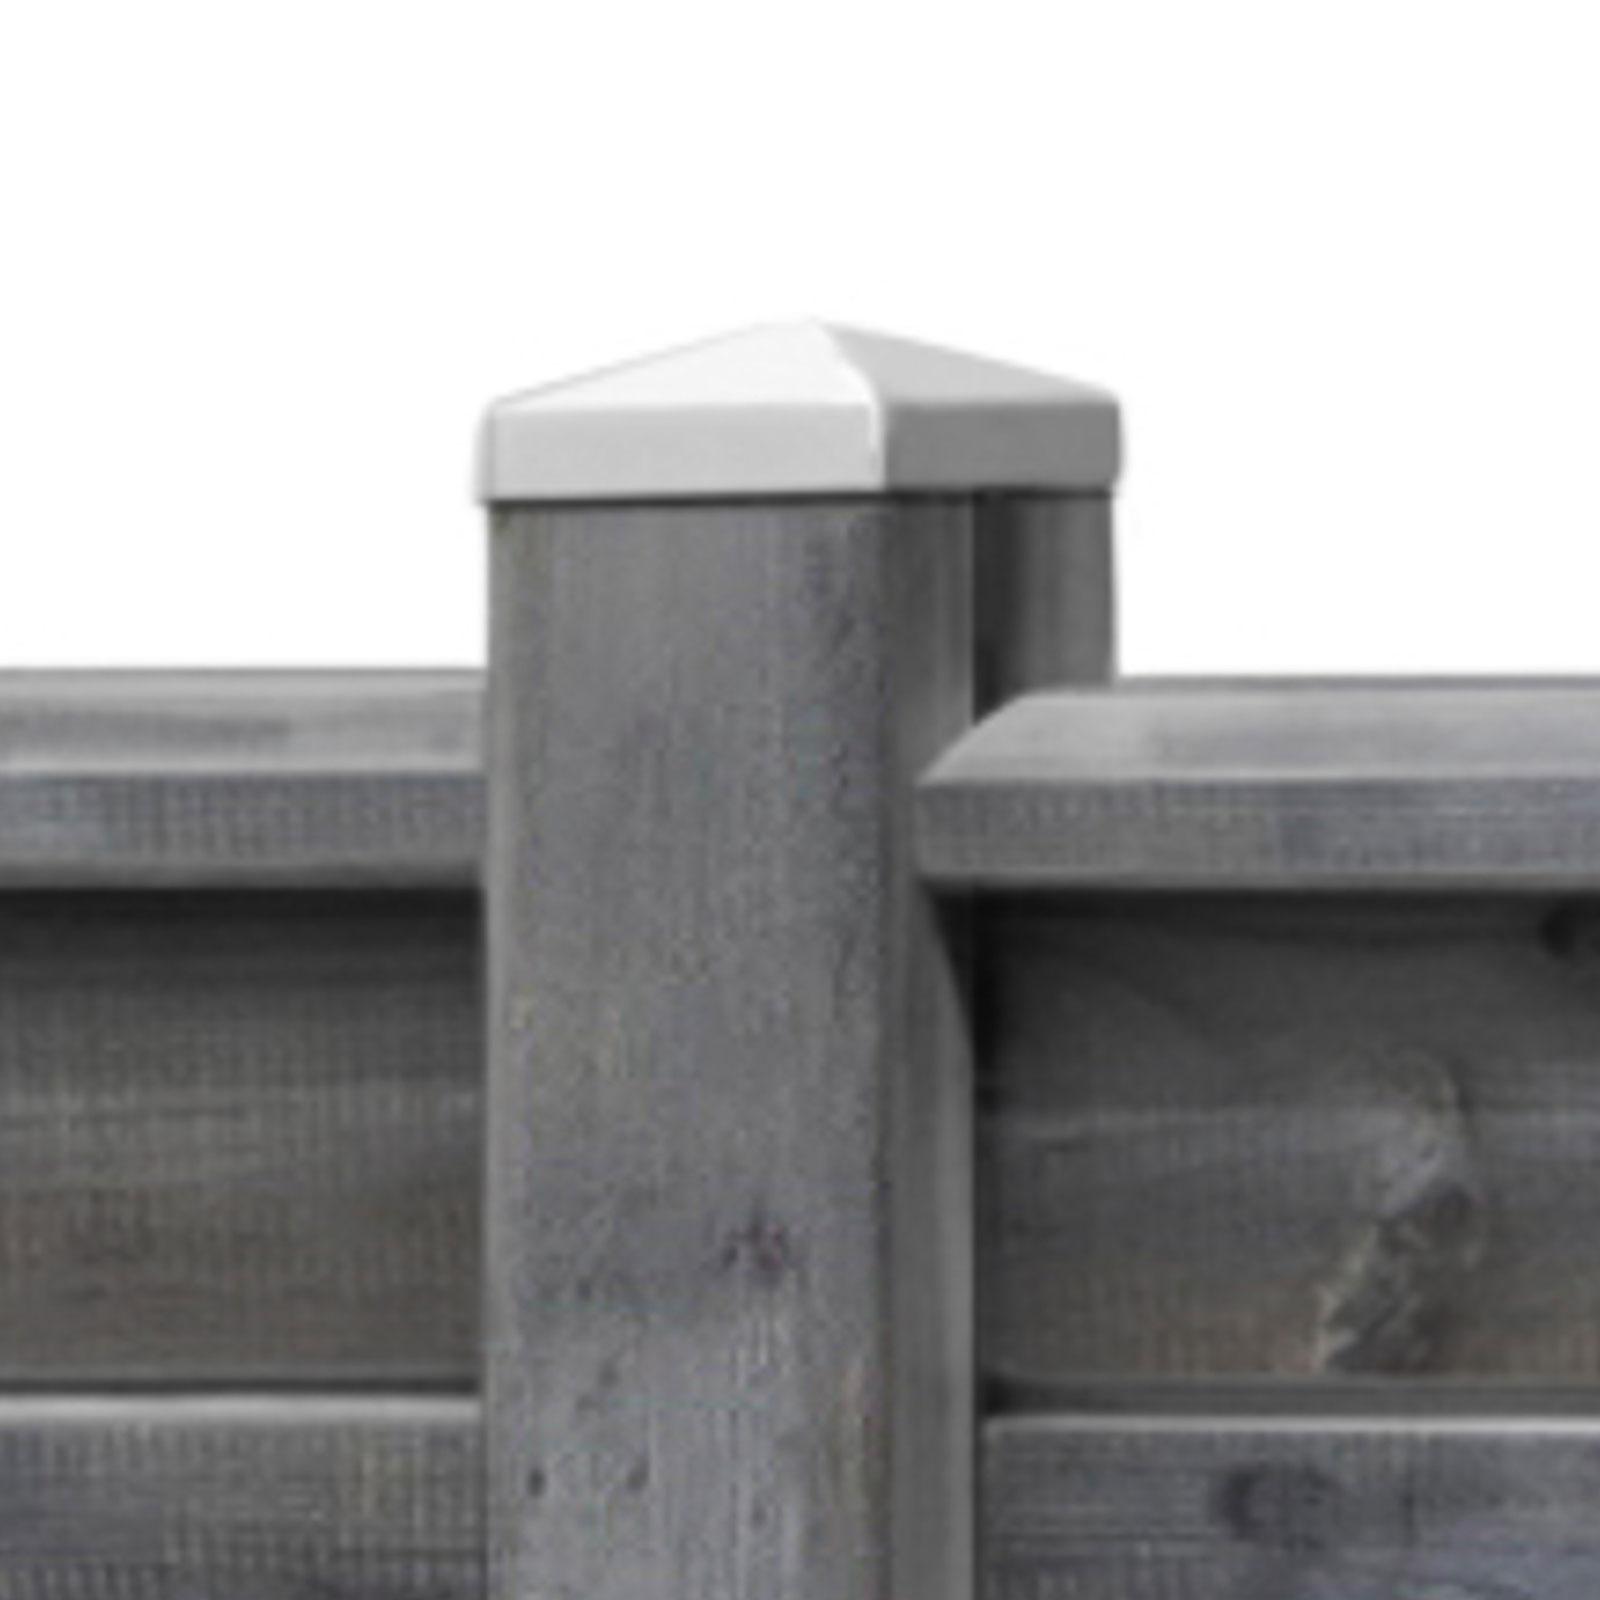 Holzzaun Sichtschutzzaun 180x180 Lamellenzaun Gartenzaun Steckzaun Grau Braun Ebay